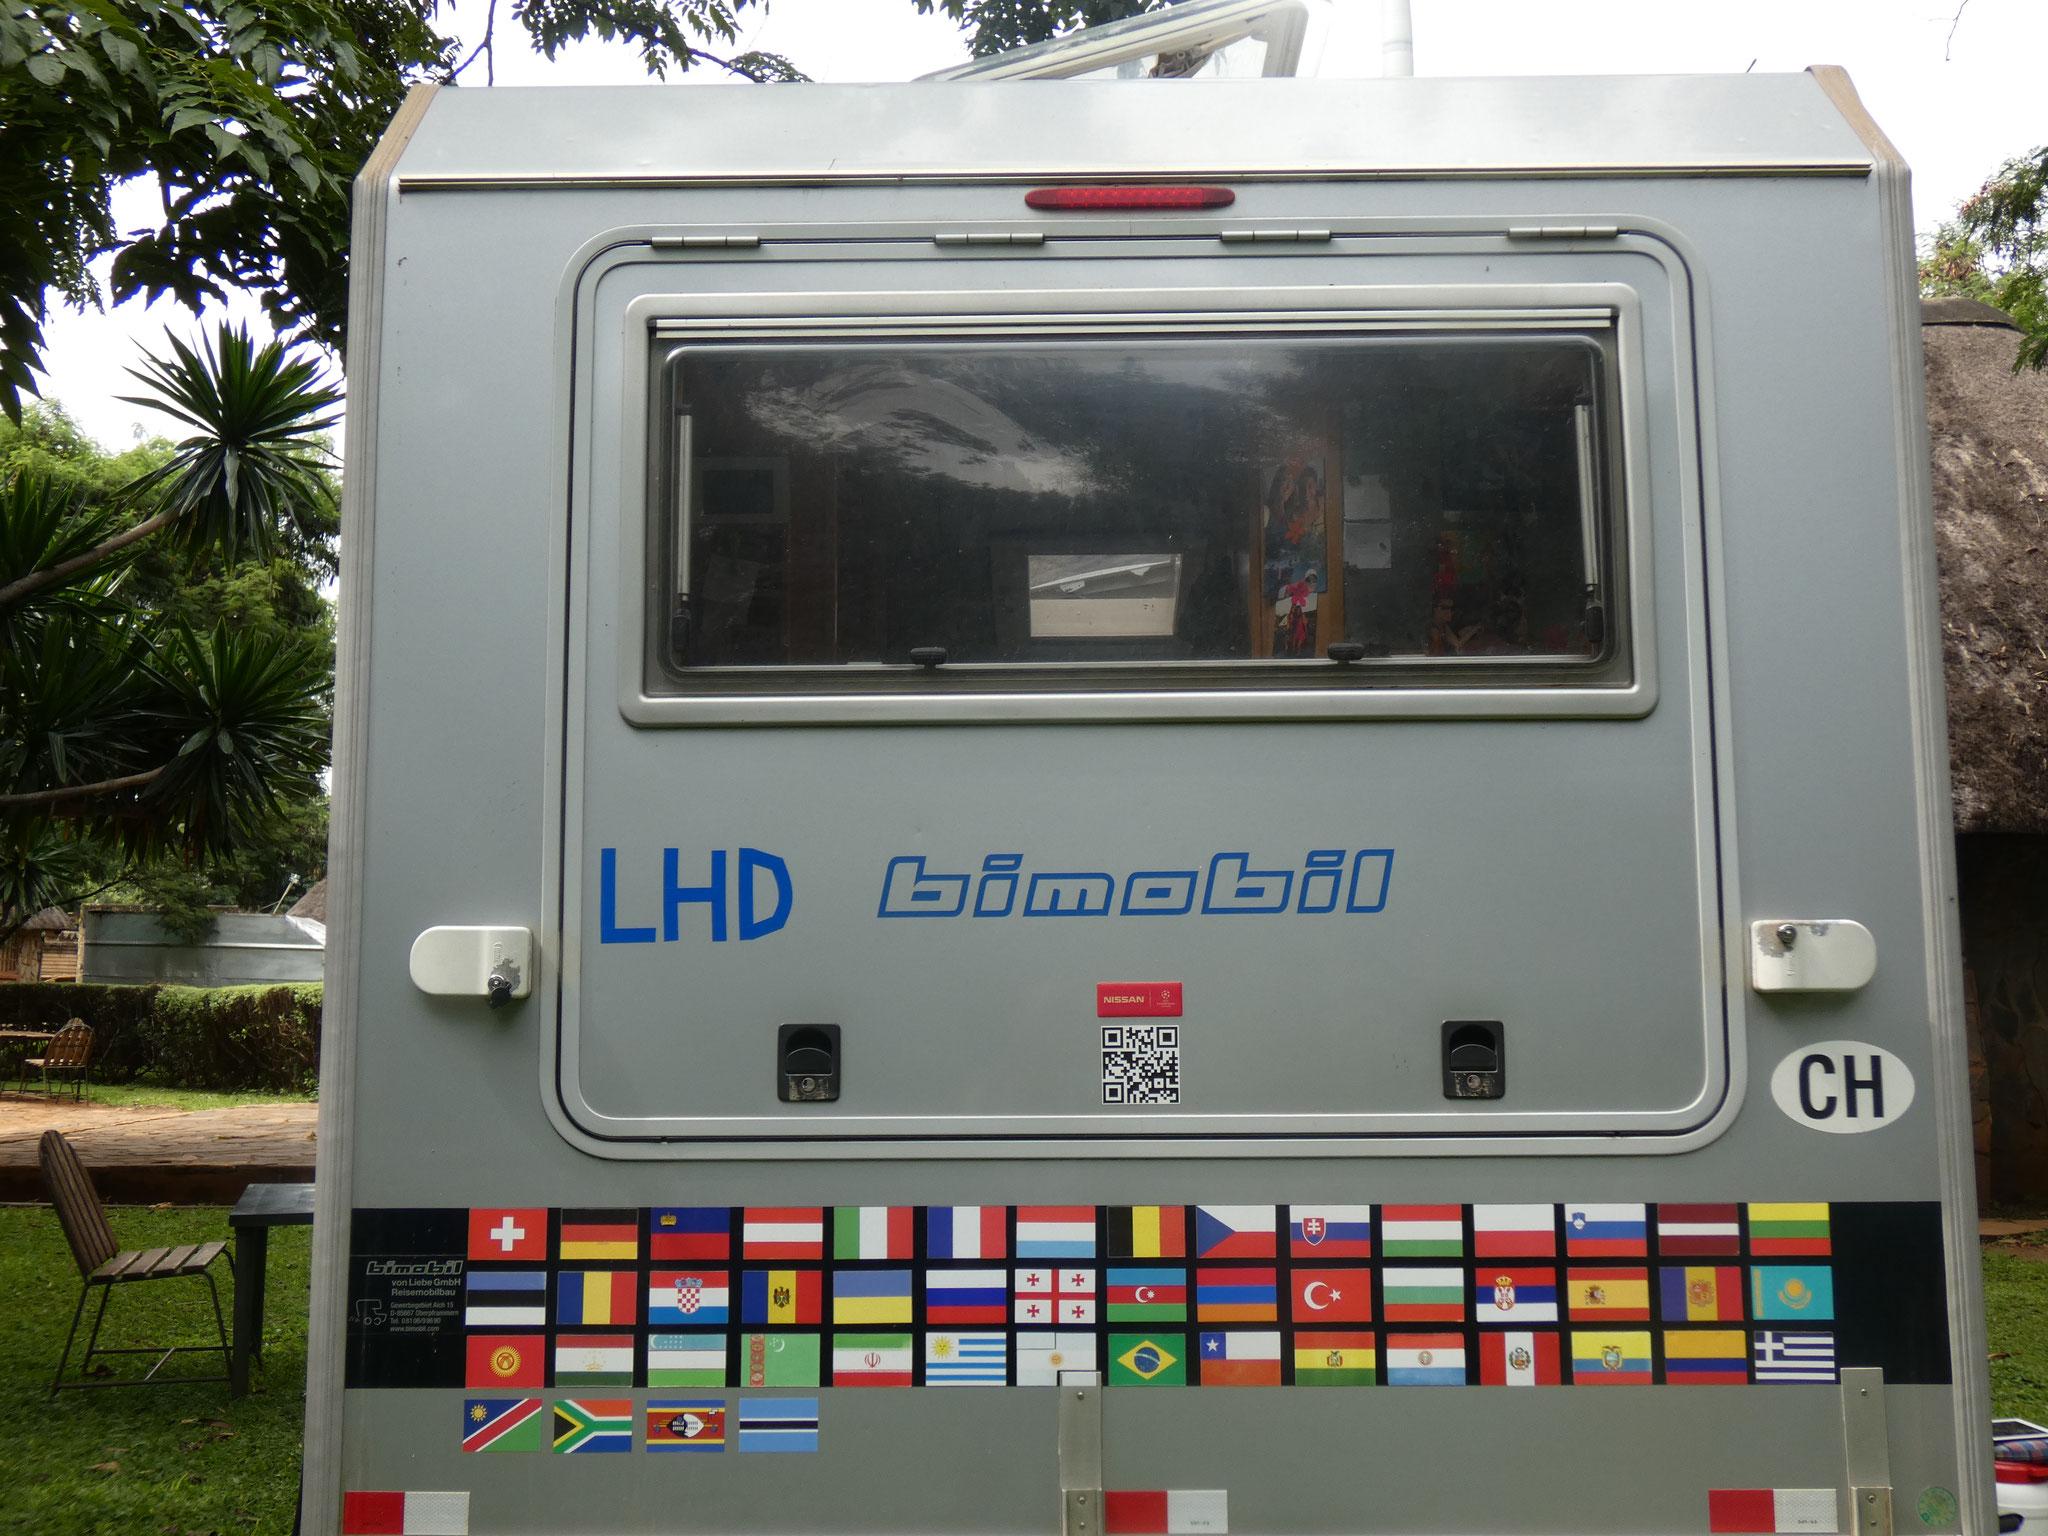 LHD (Lefthanddrive)